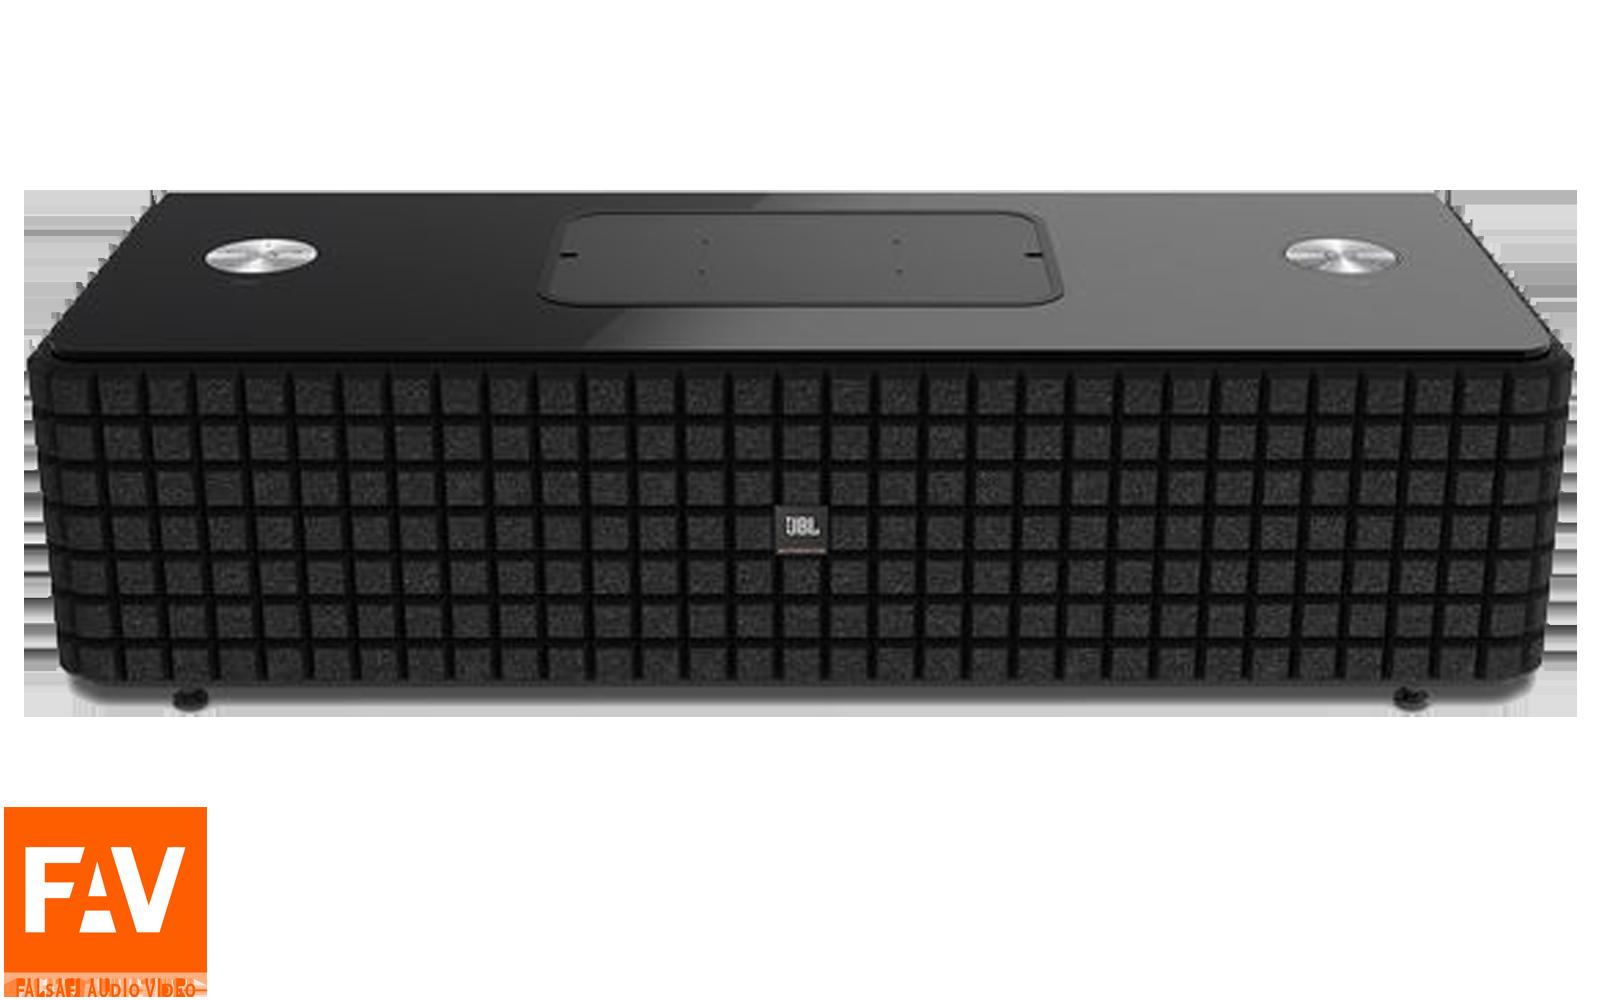 اسپیکر JBL مدل Authentics L8